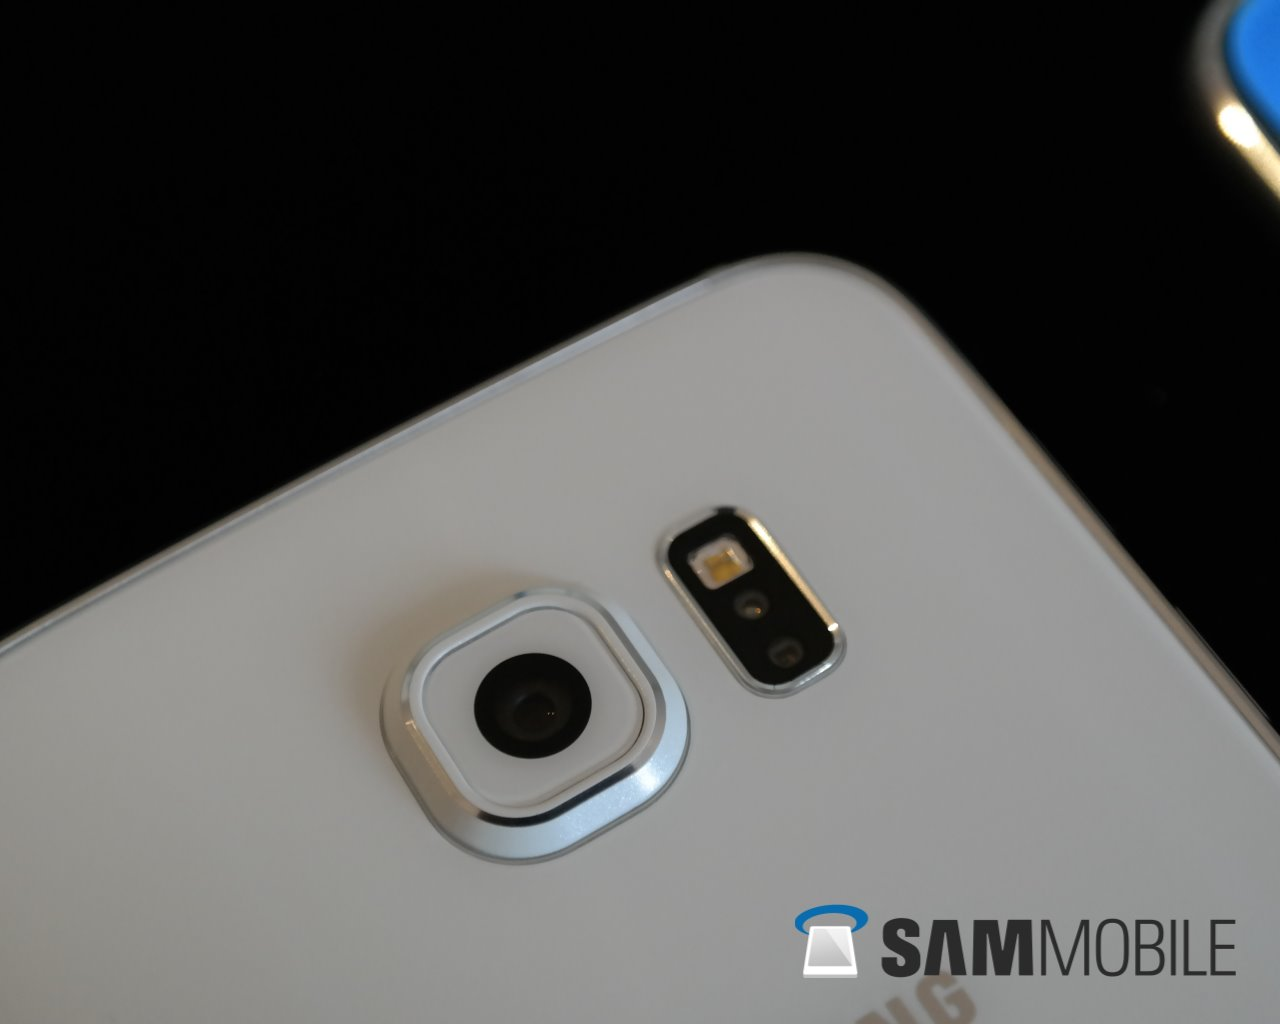 appareil photo samsung s6